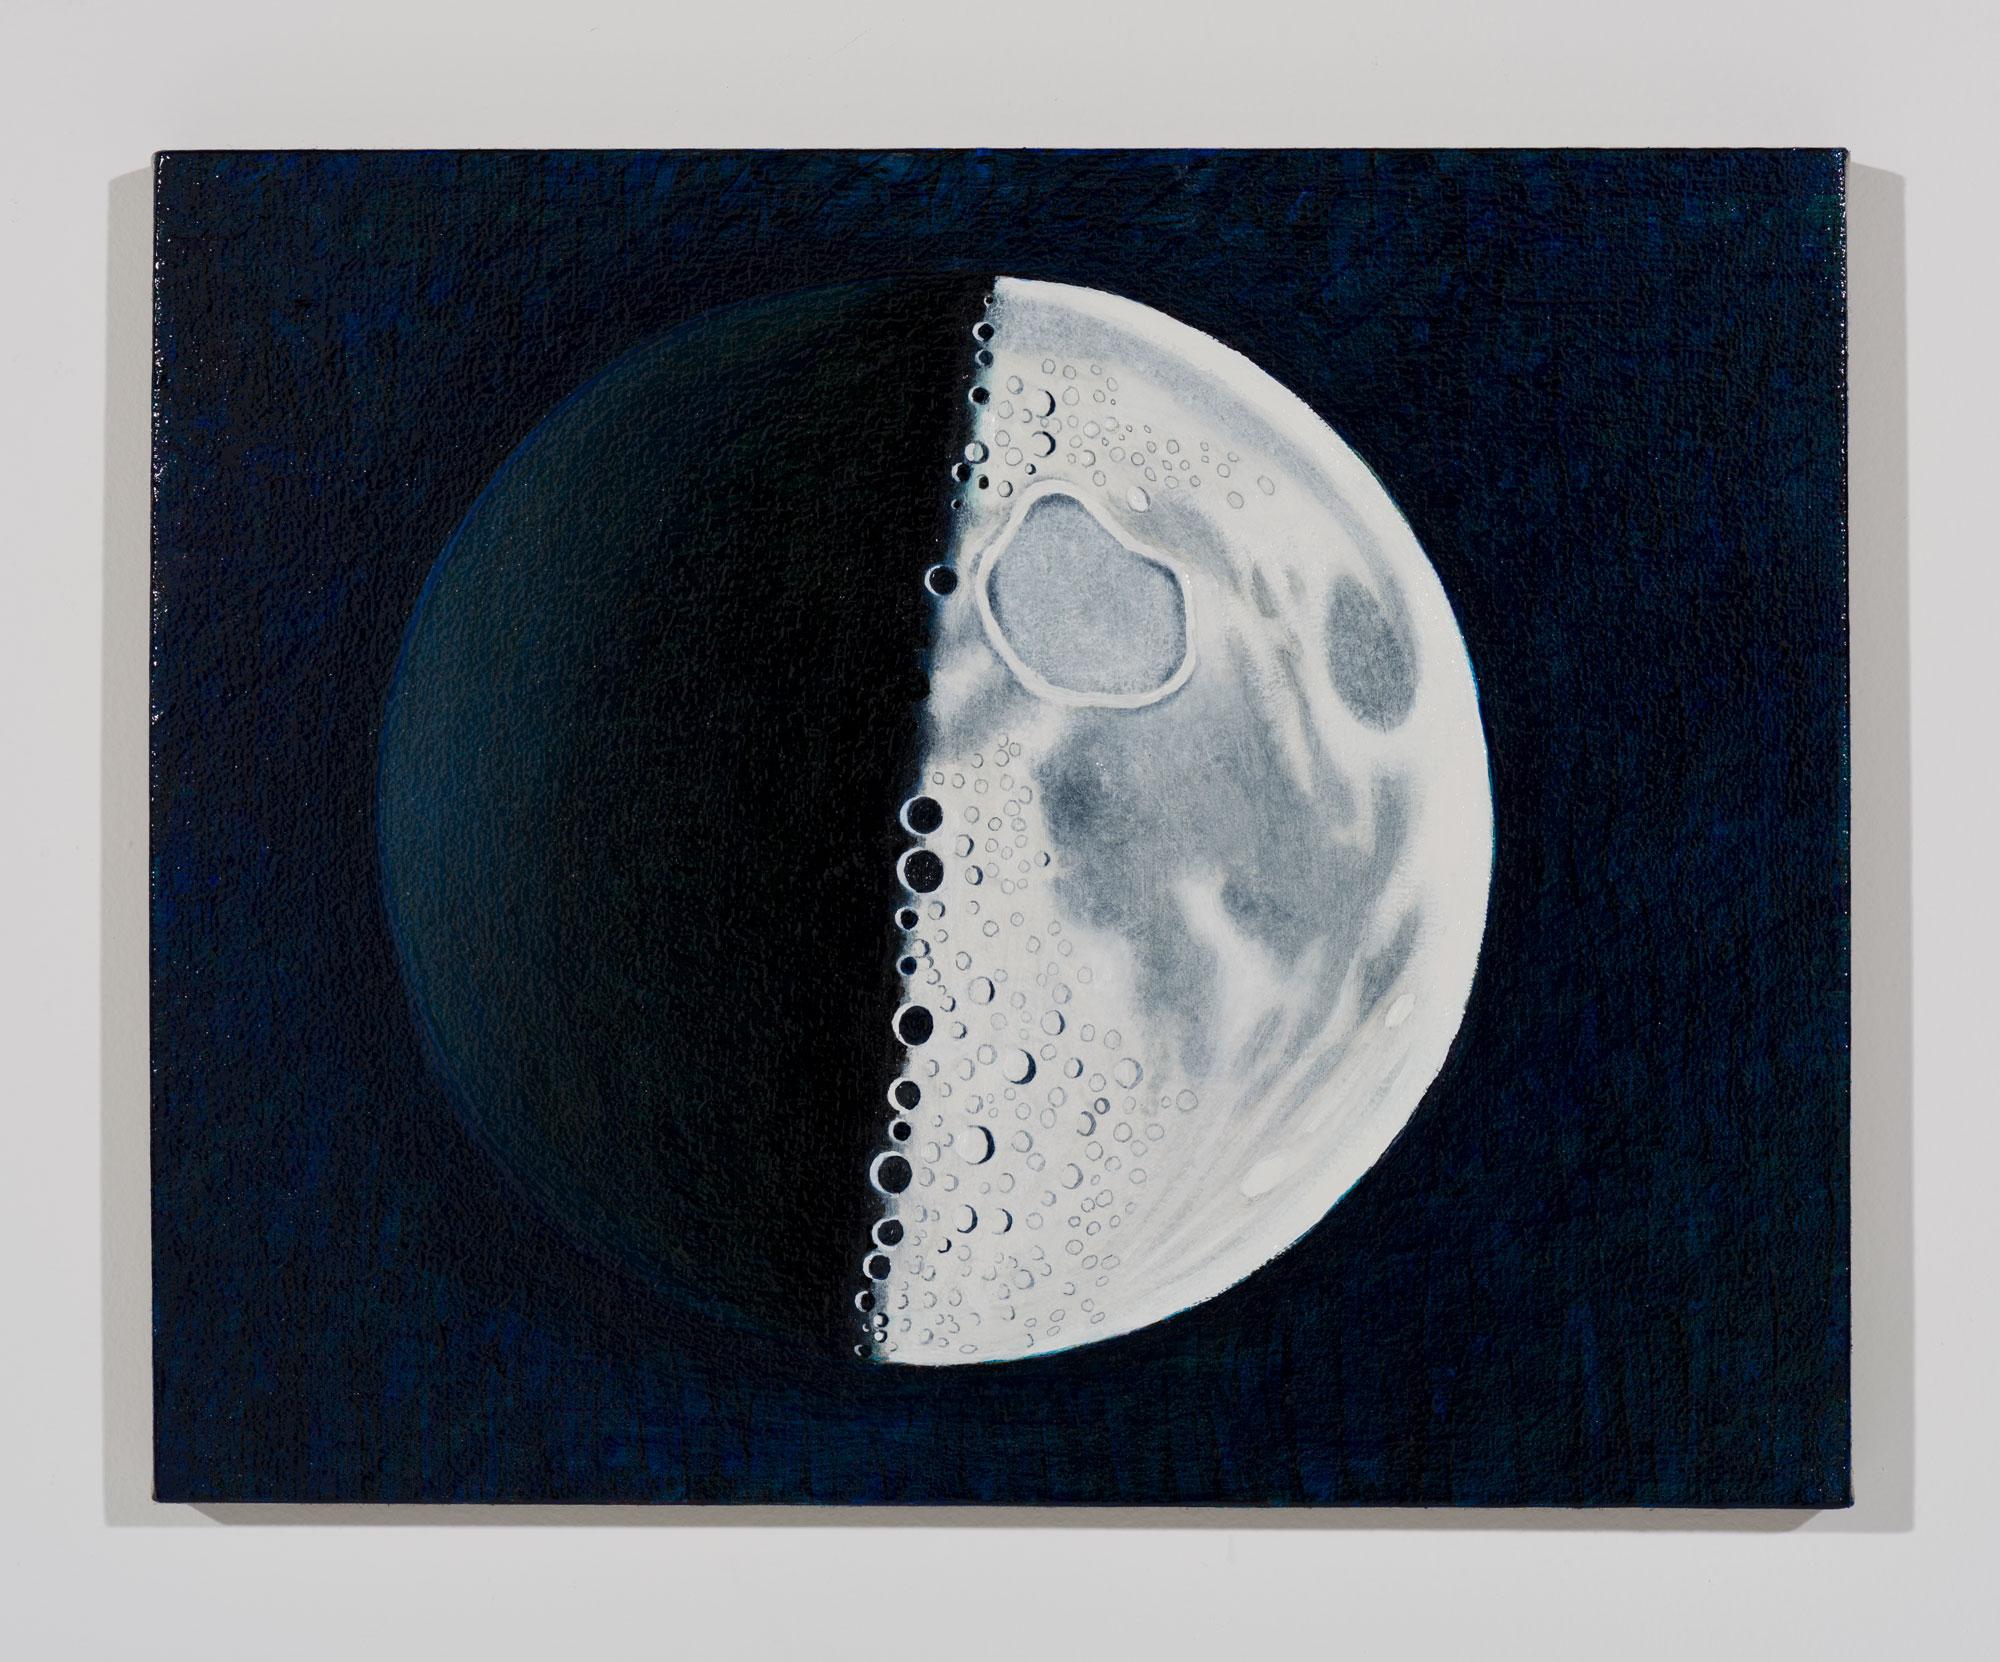 The Moon 9.16.18, 2019